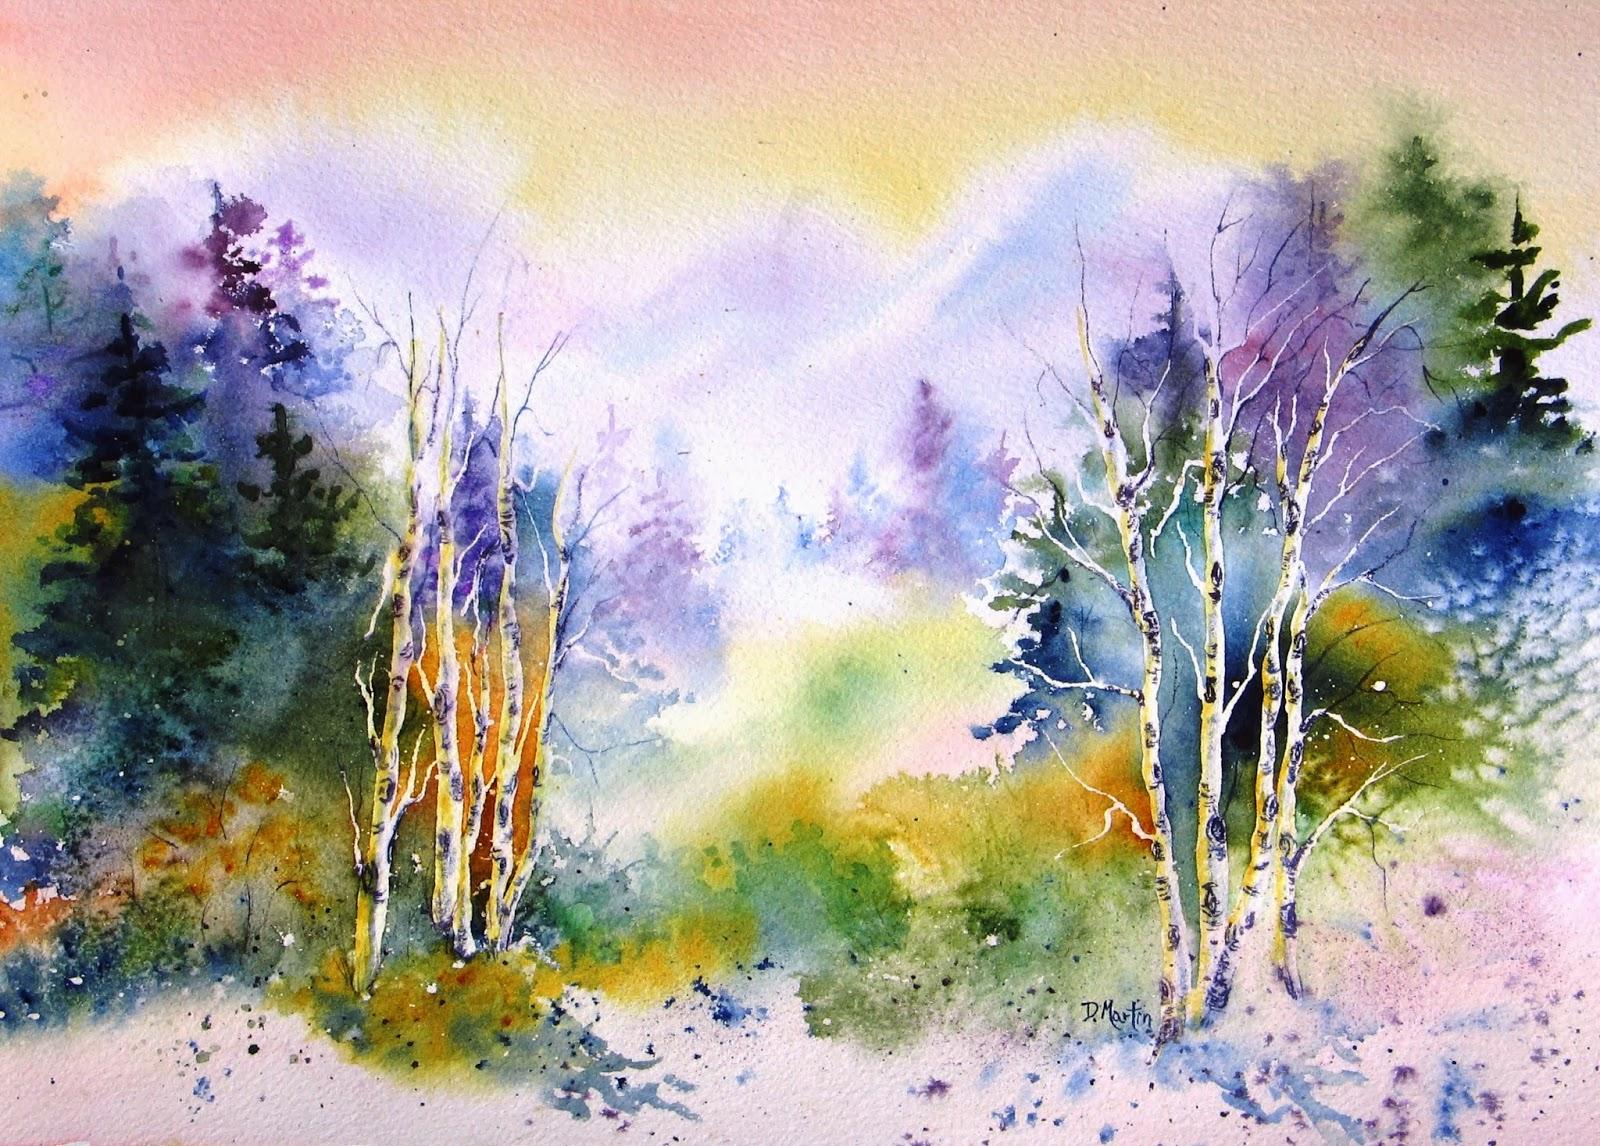 Landscape Elements in Watercolor